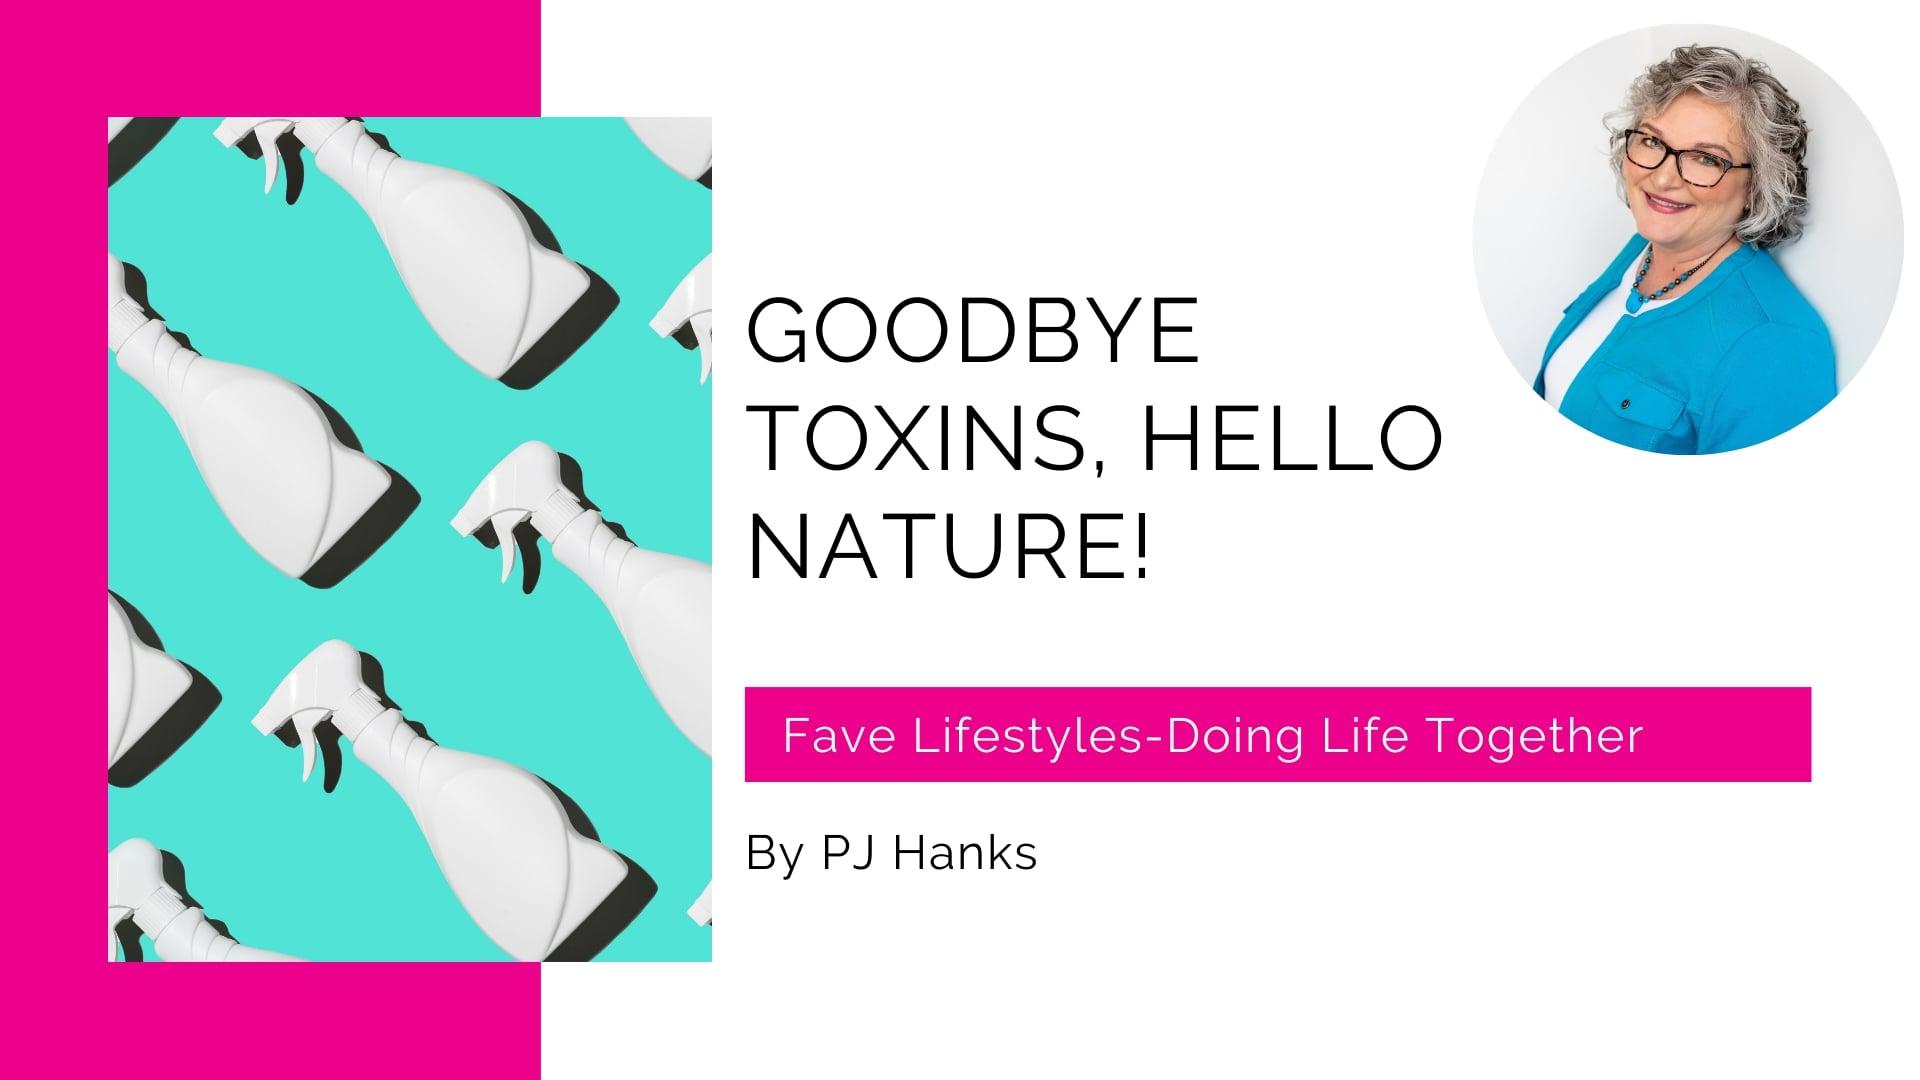 Goodbye Toxins, Hello Nature!